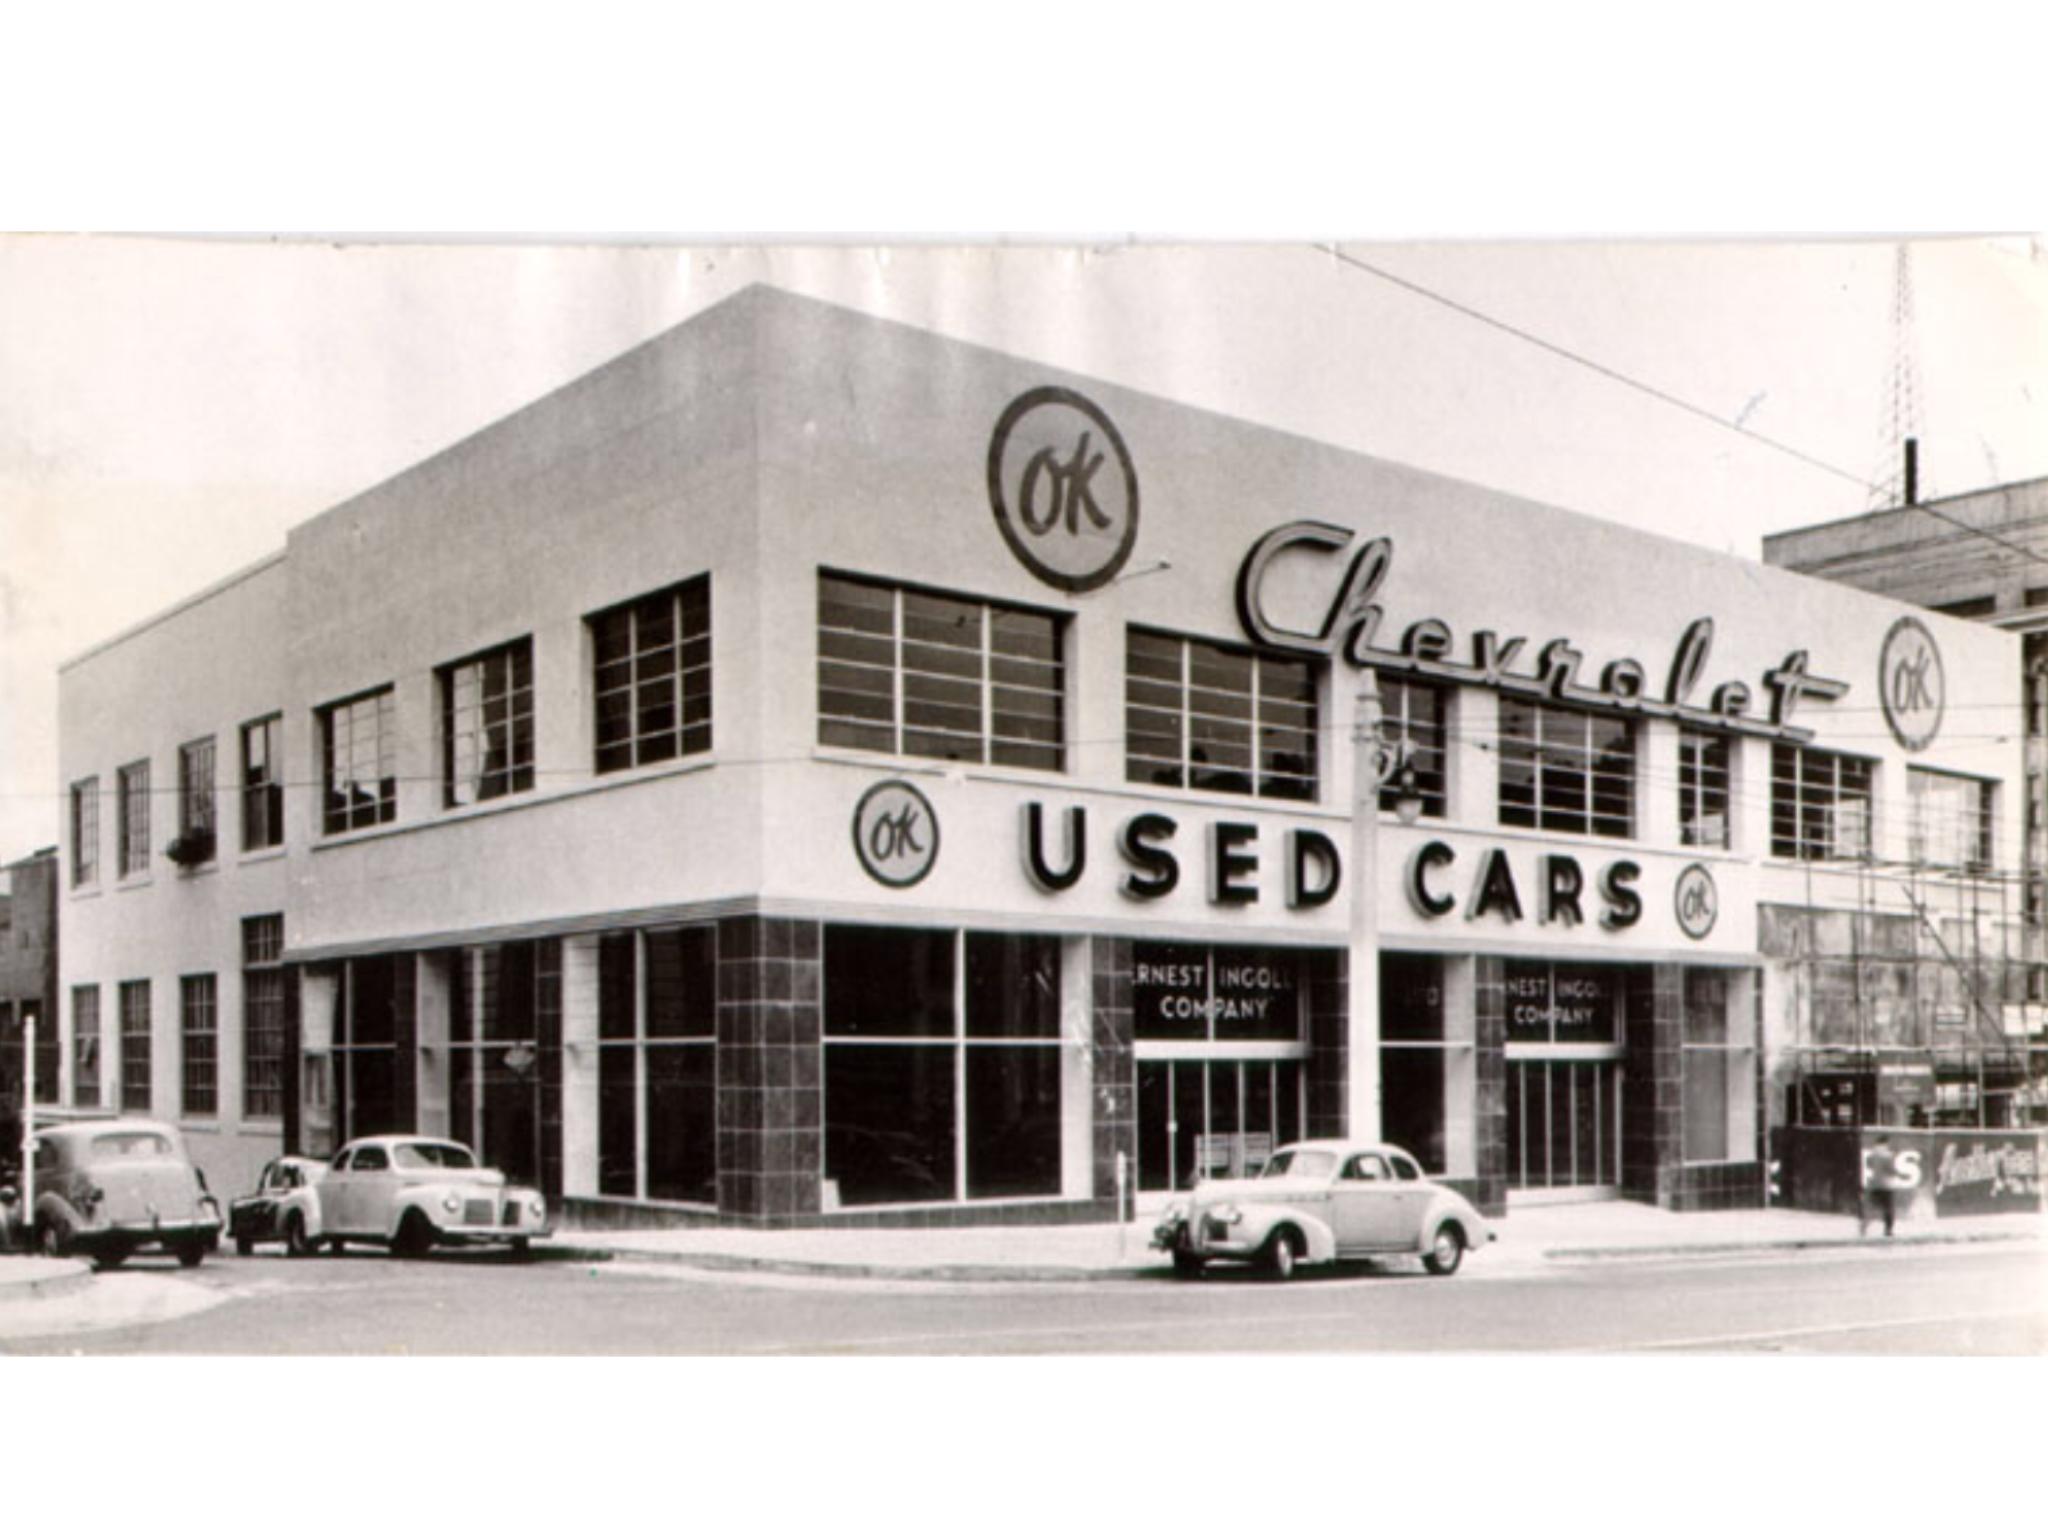 Ernest Ingold Chevrolet Dealership Los Angeles California